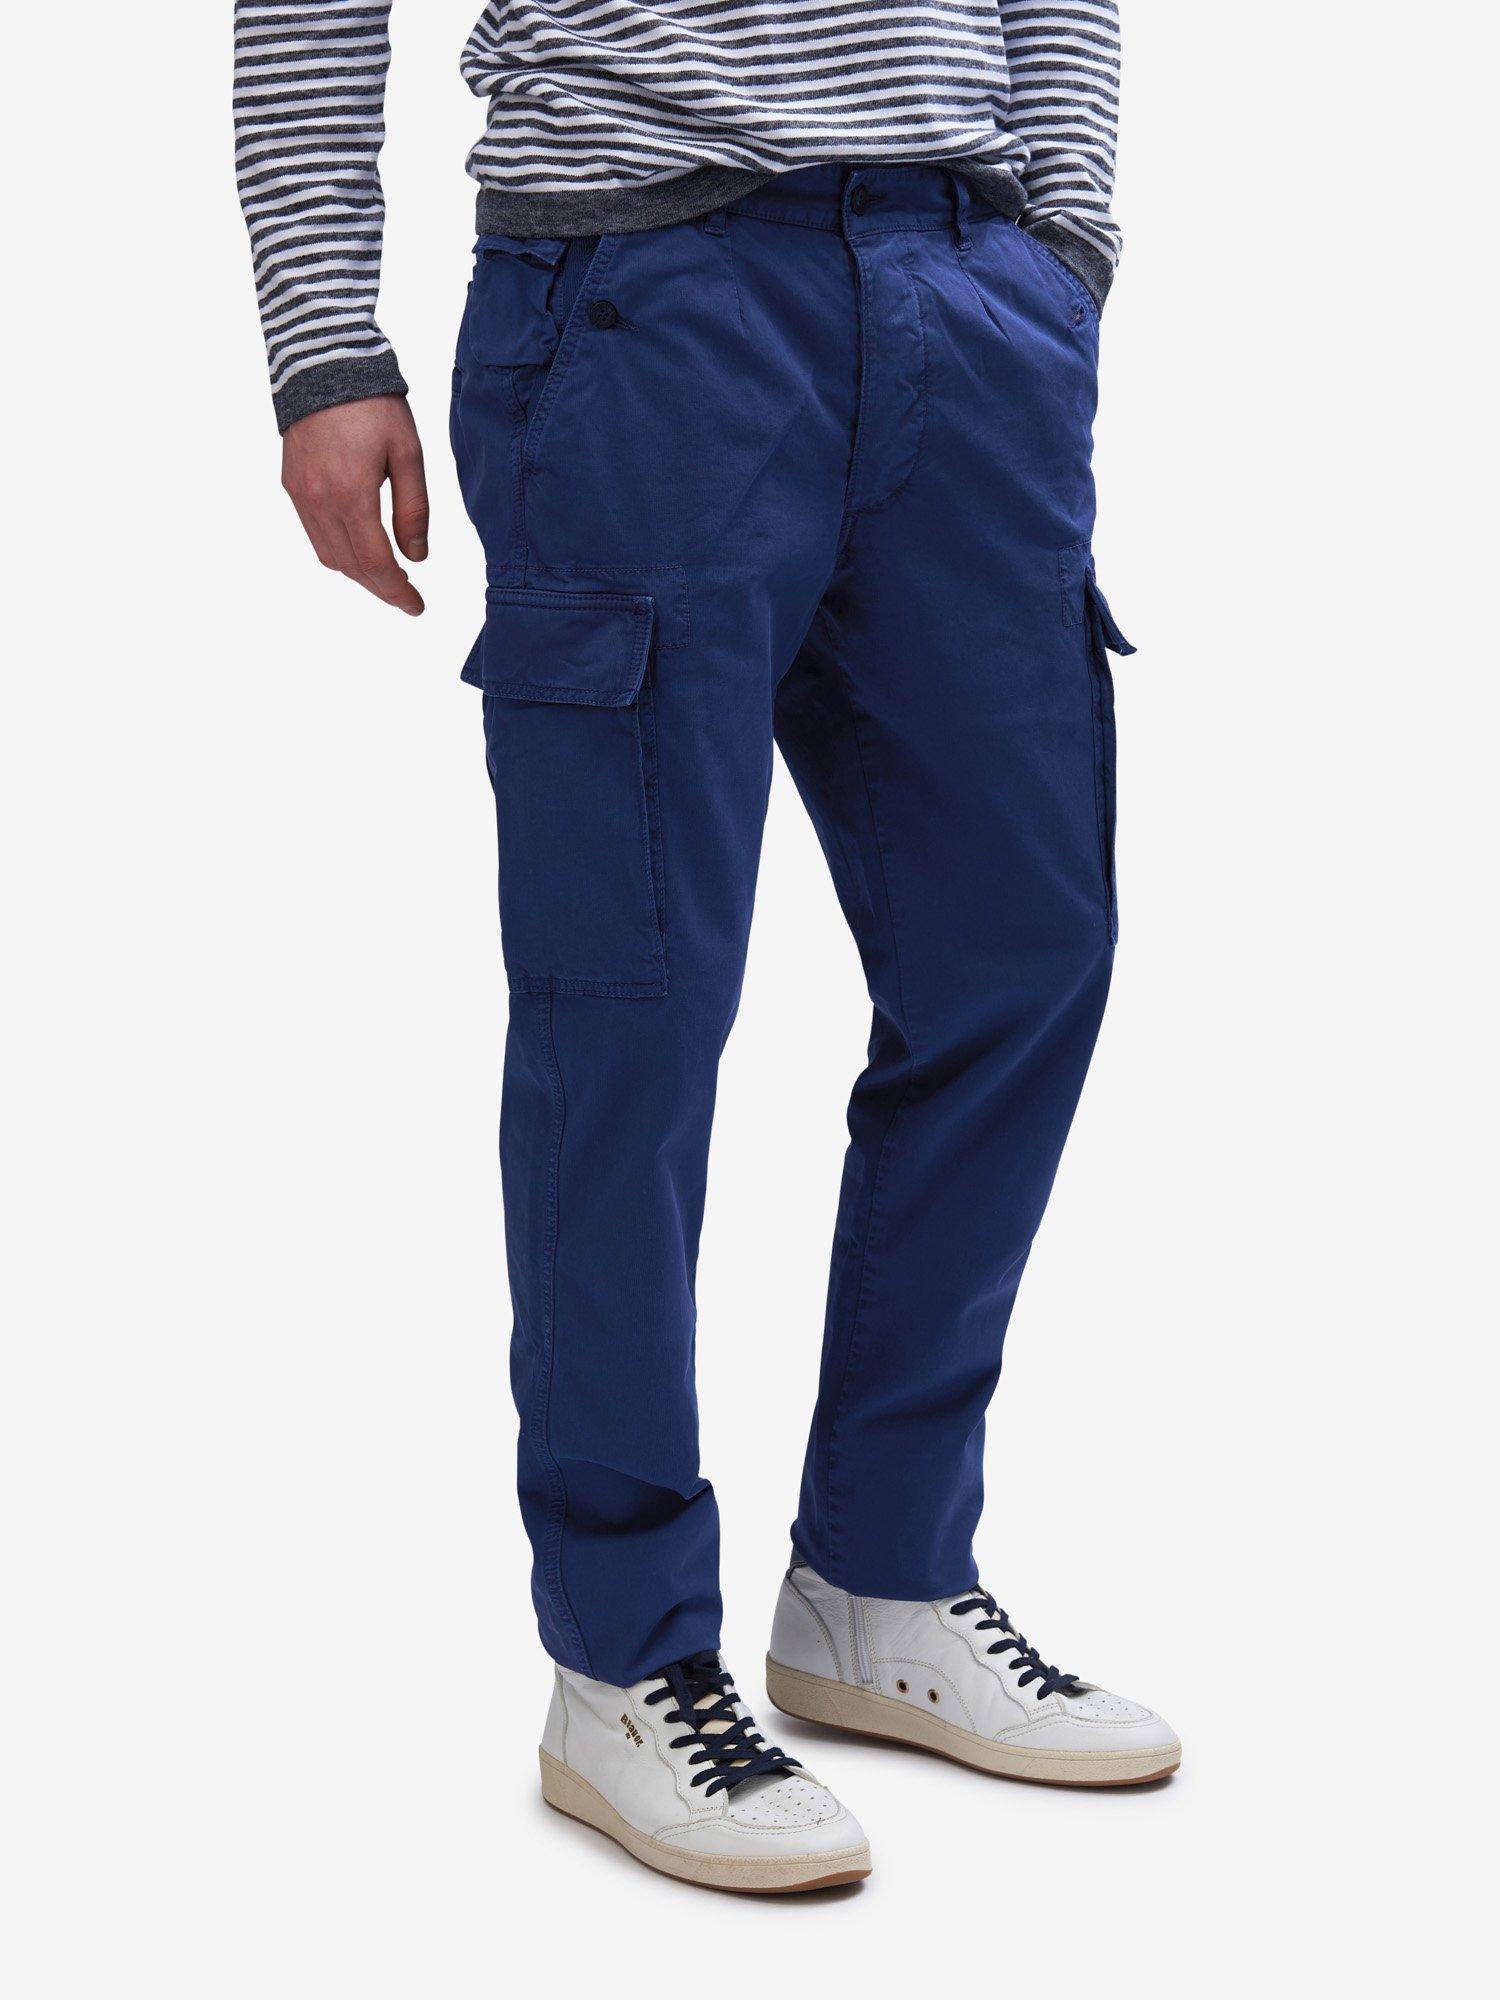 Blauer - MULTI-POCKET CARGO PANTS - Blue Sapphire - Blauer